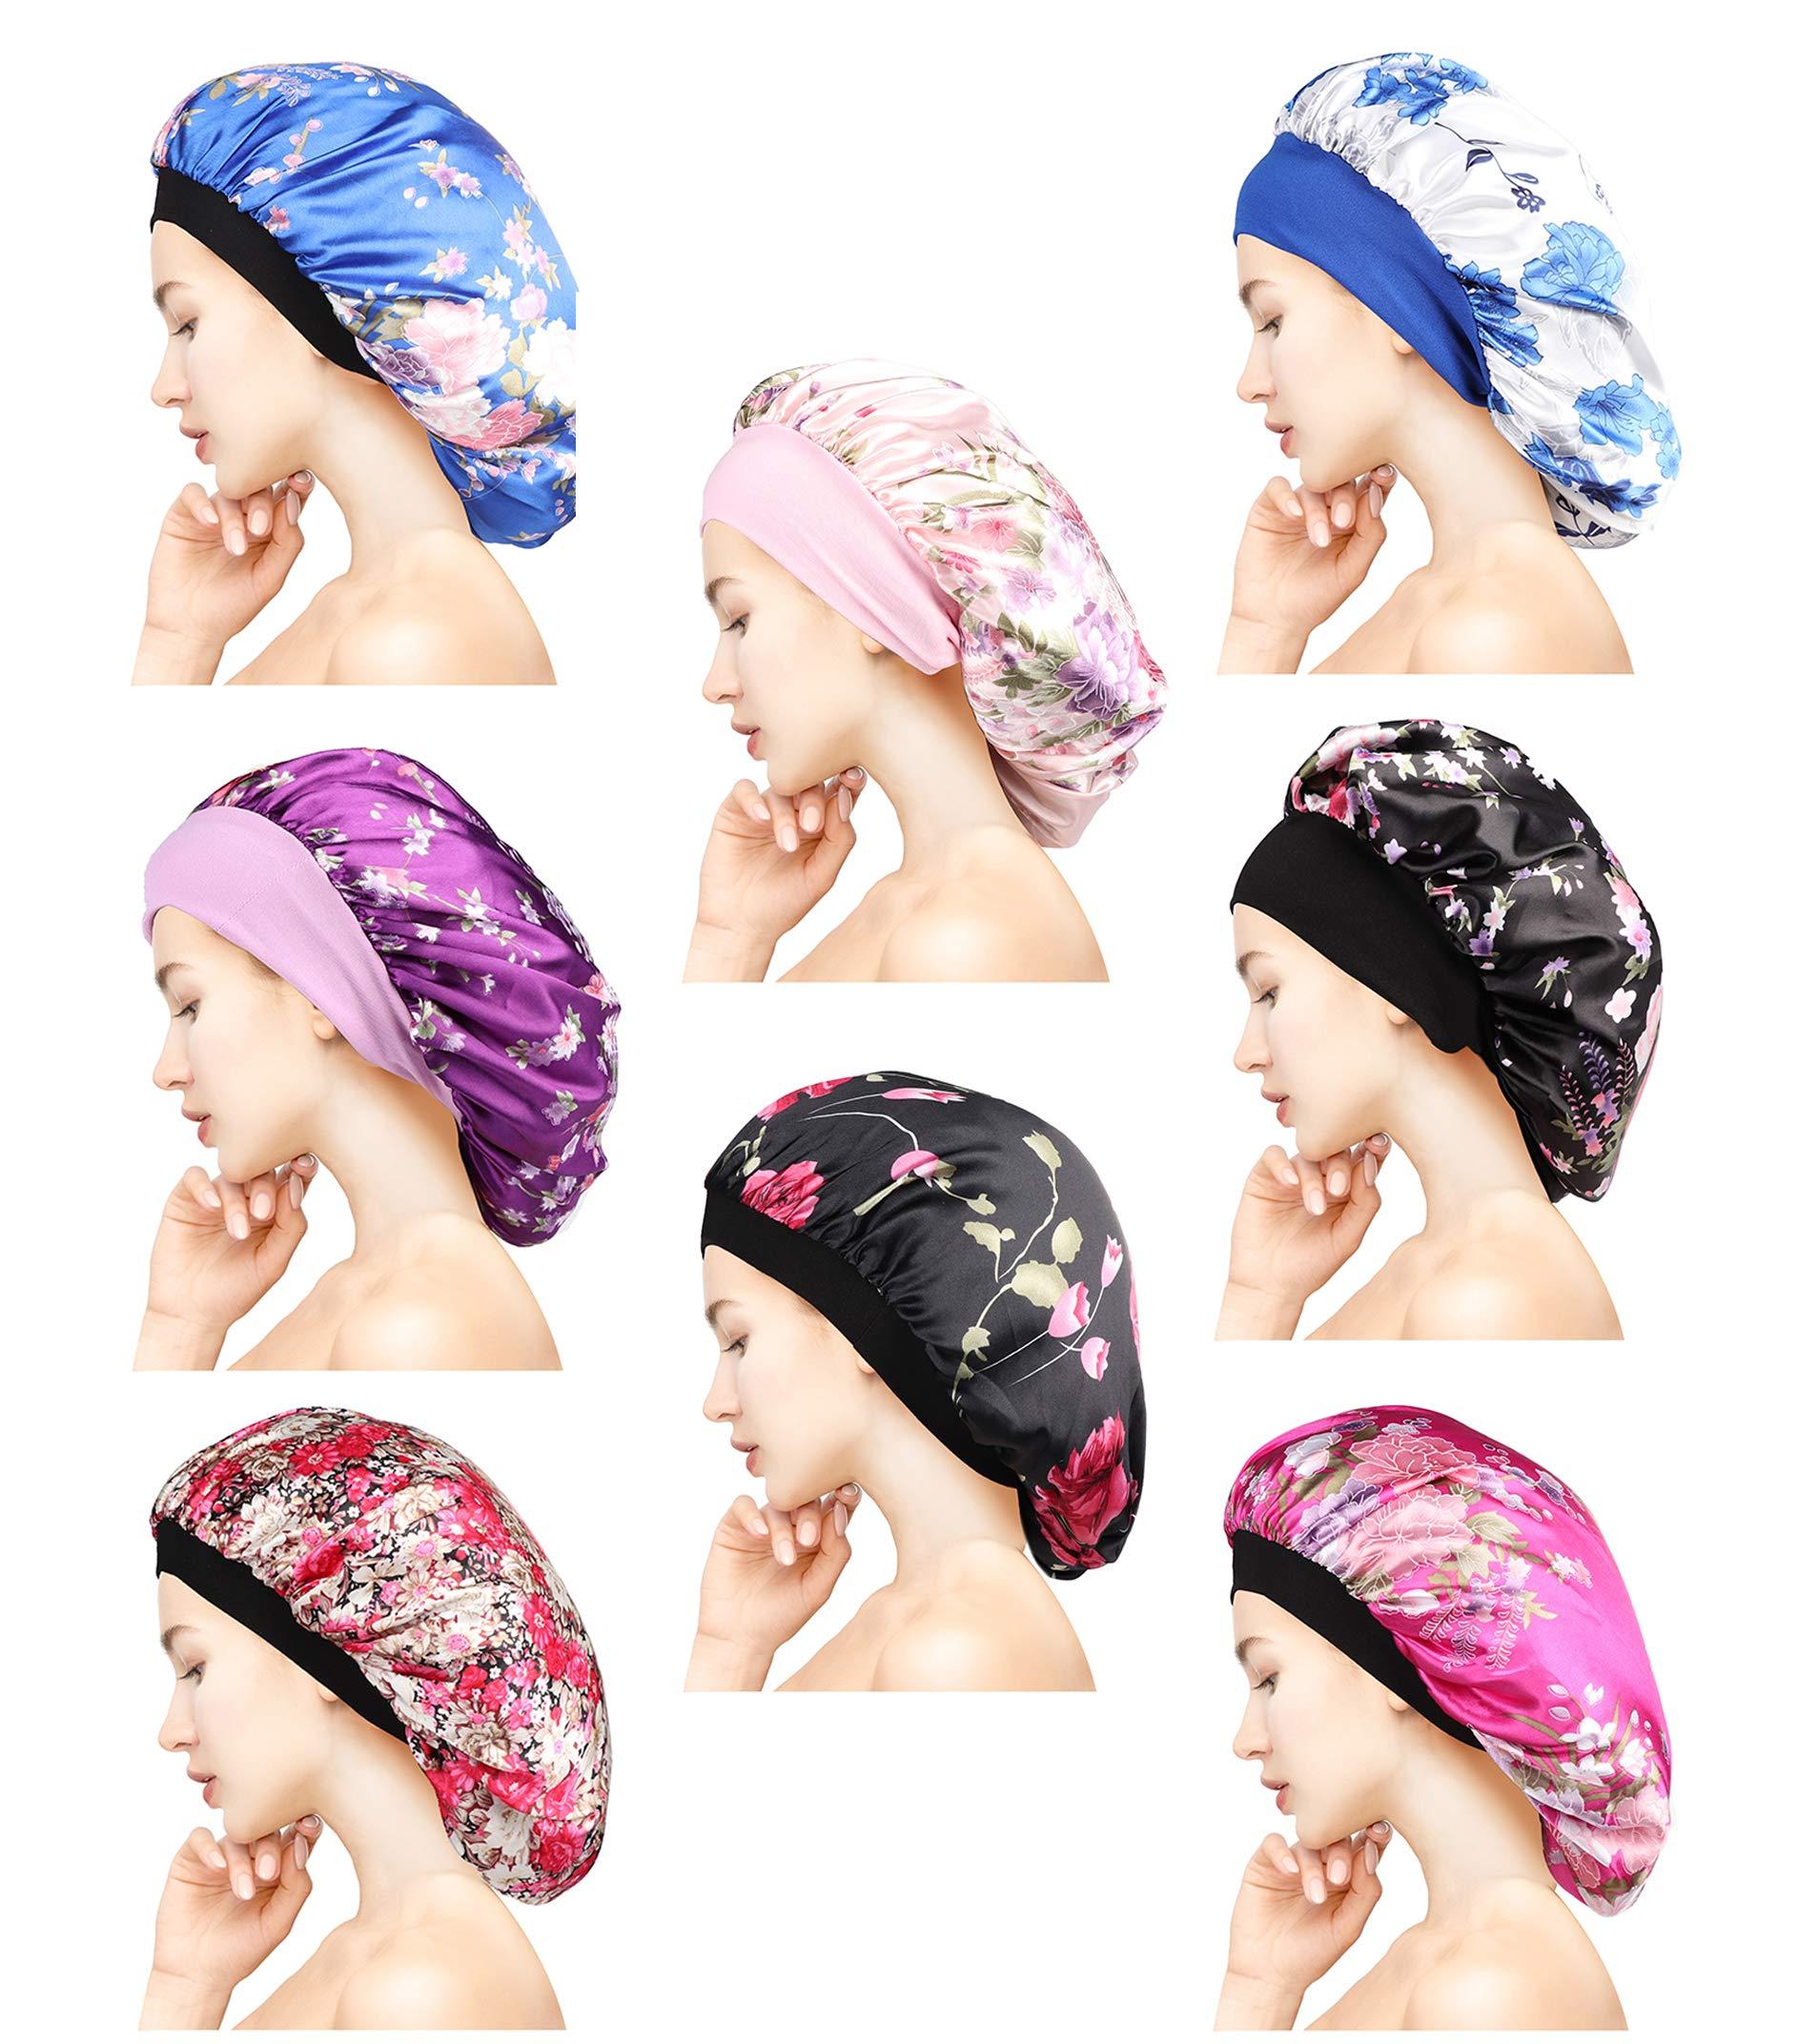 Adramata 8 Pieces Satin Bonnet Night Sleep Cap Sleeping Head Cover for Women Girl Sleeping Set